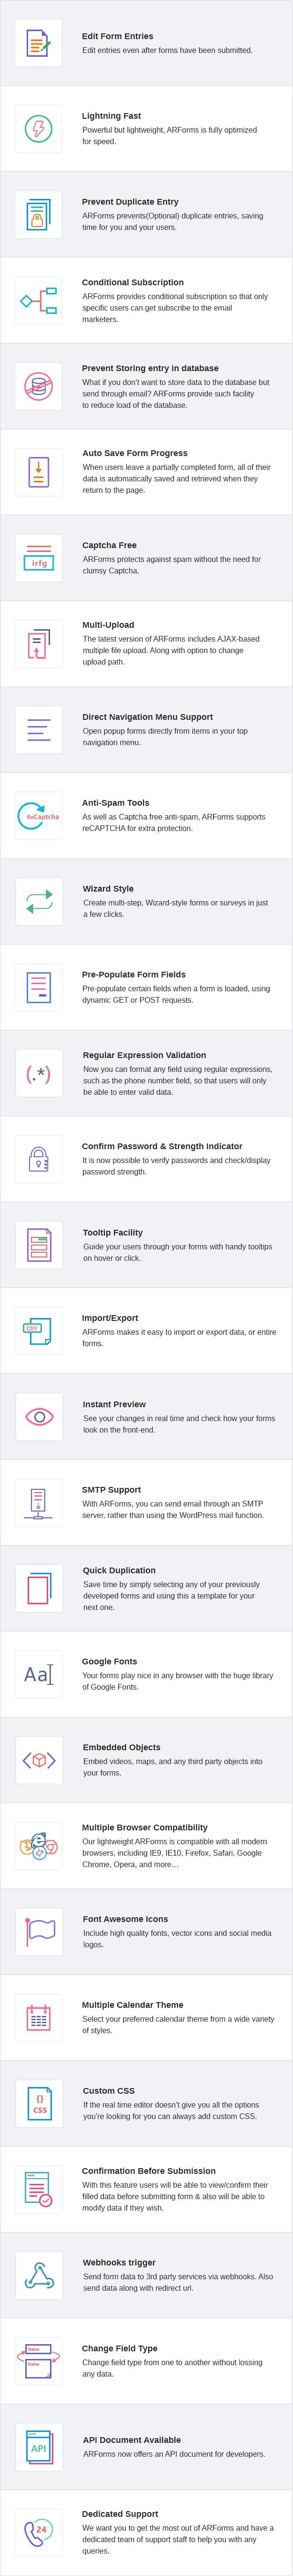 ARForms: Plugin Trình tạo biểu mẫu WordPress - 51